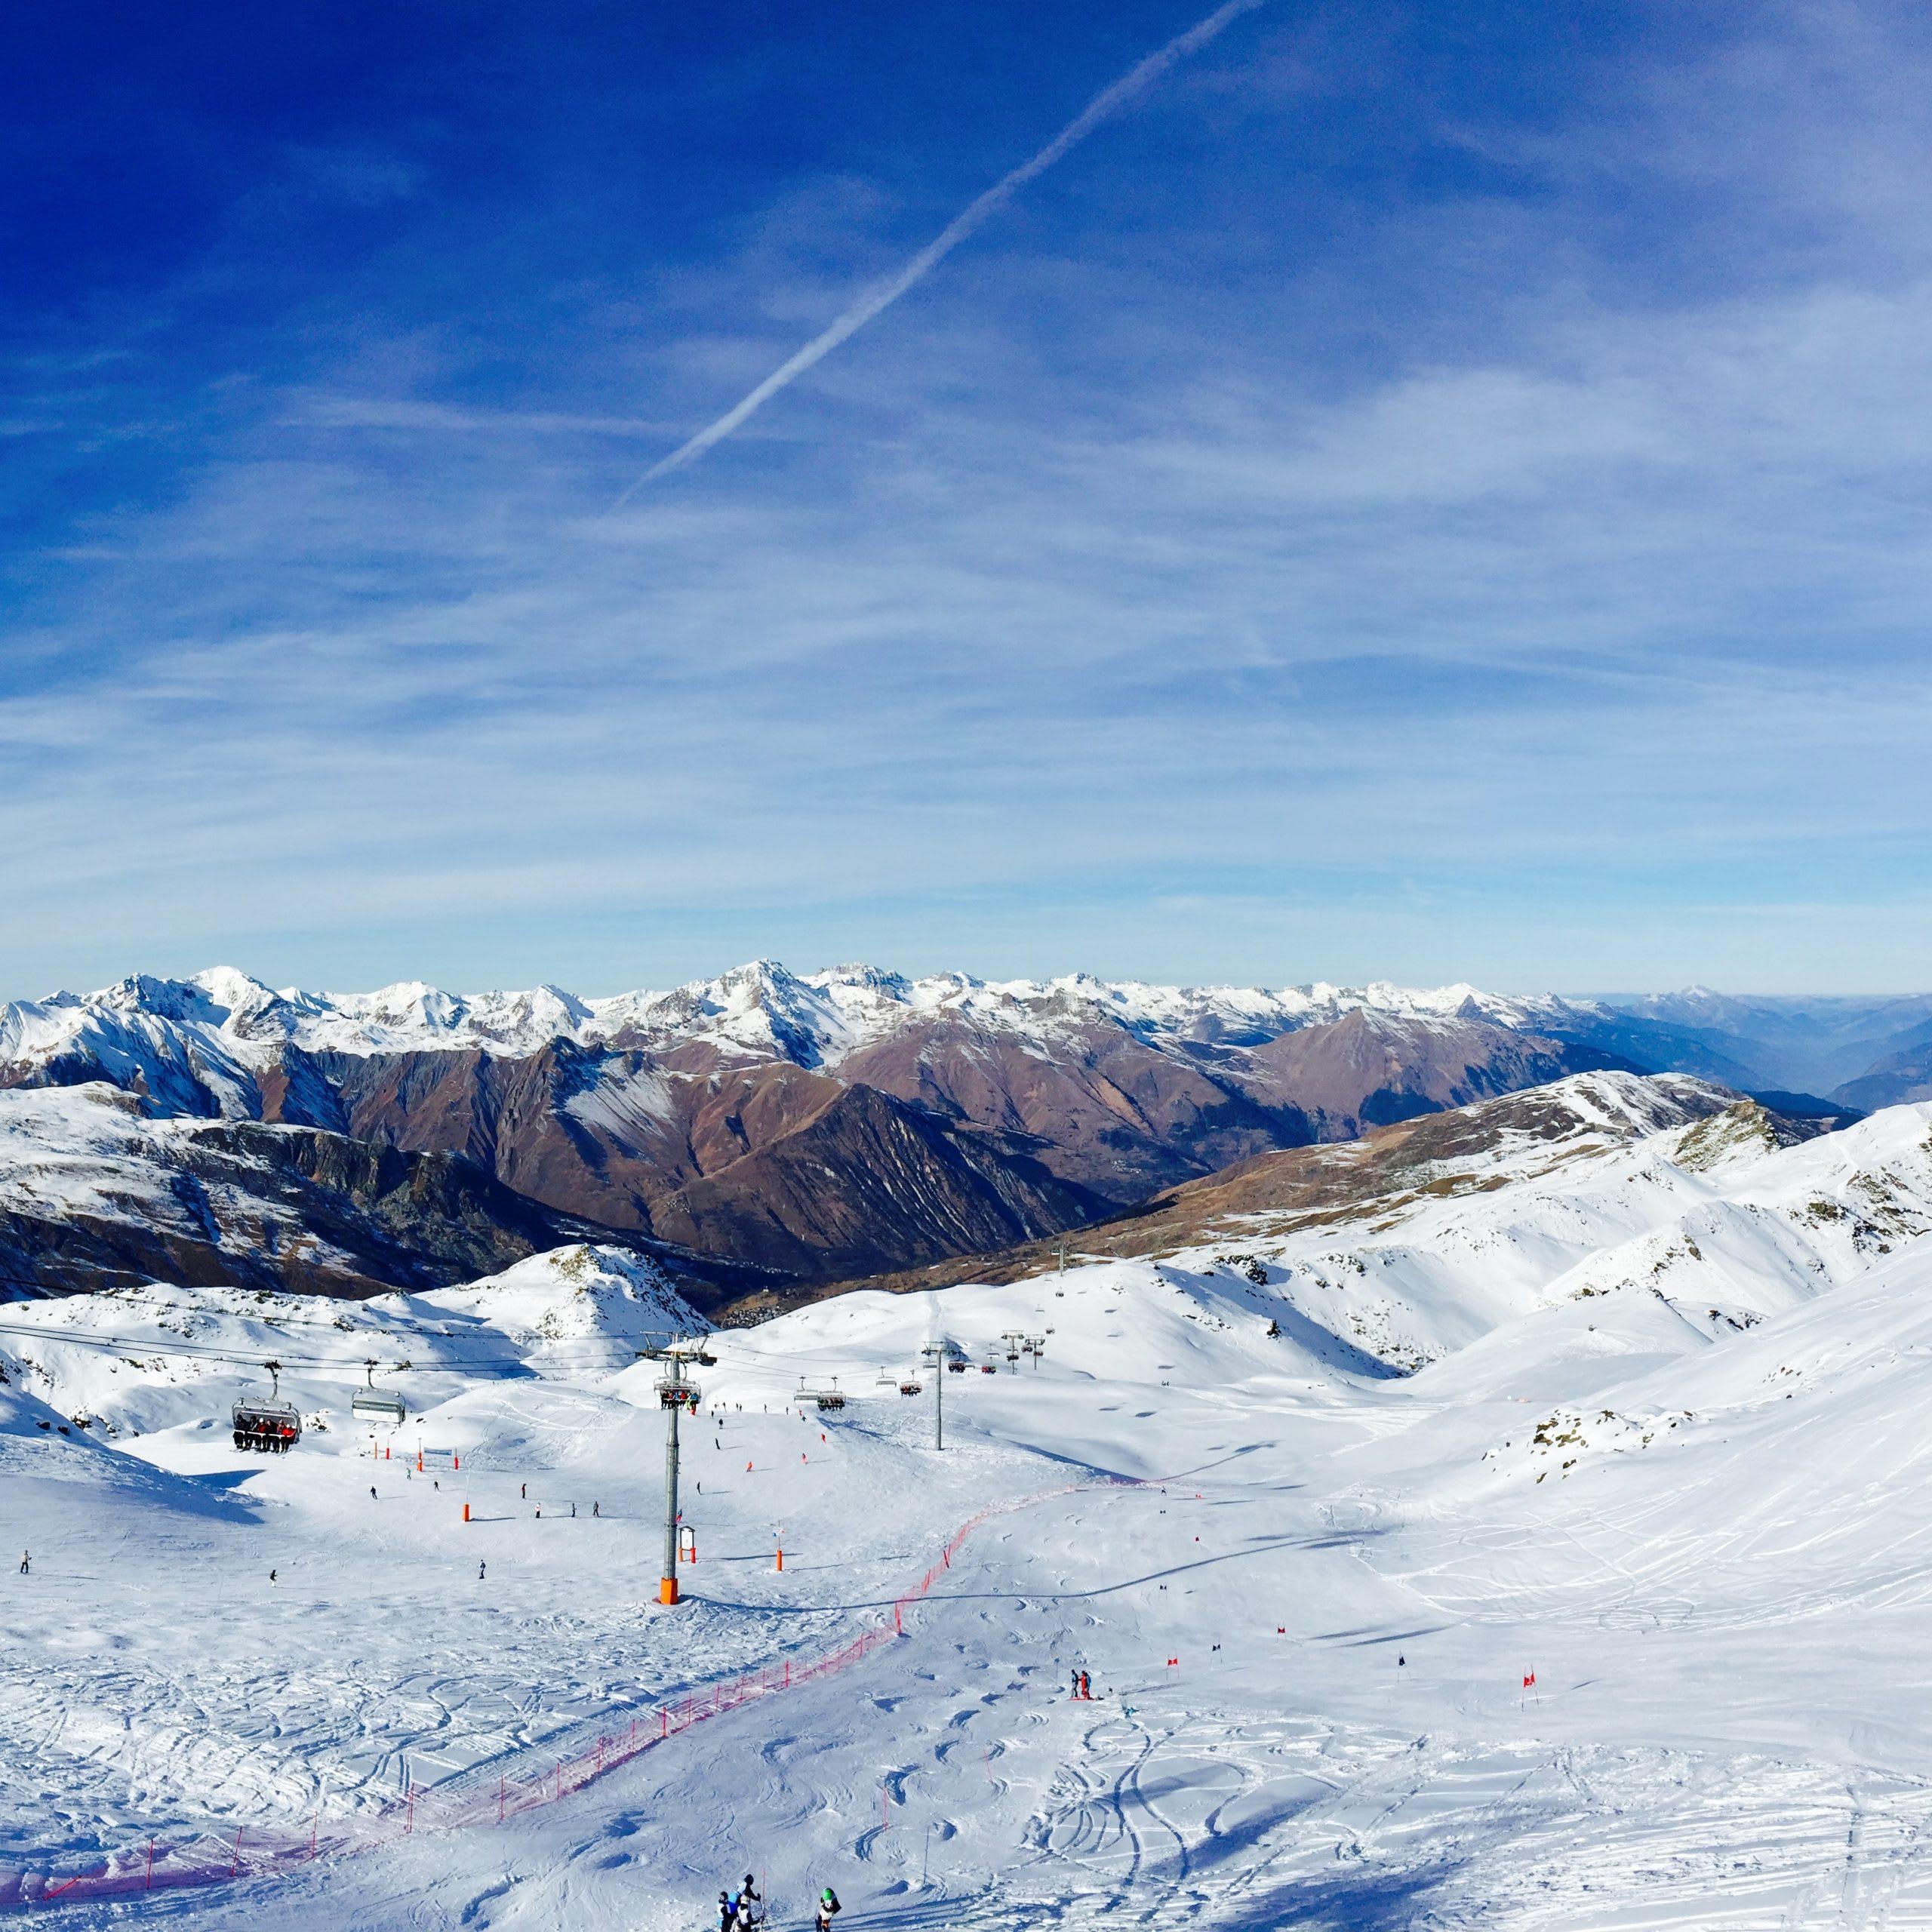 European Ski Destinations - France